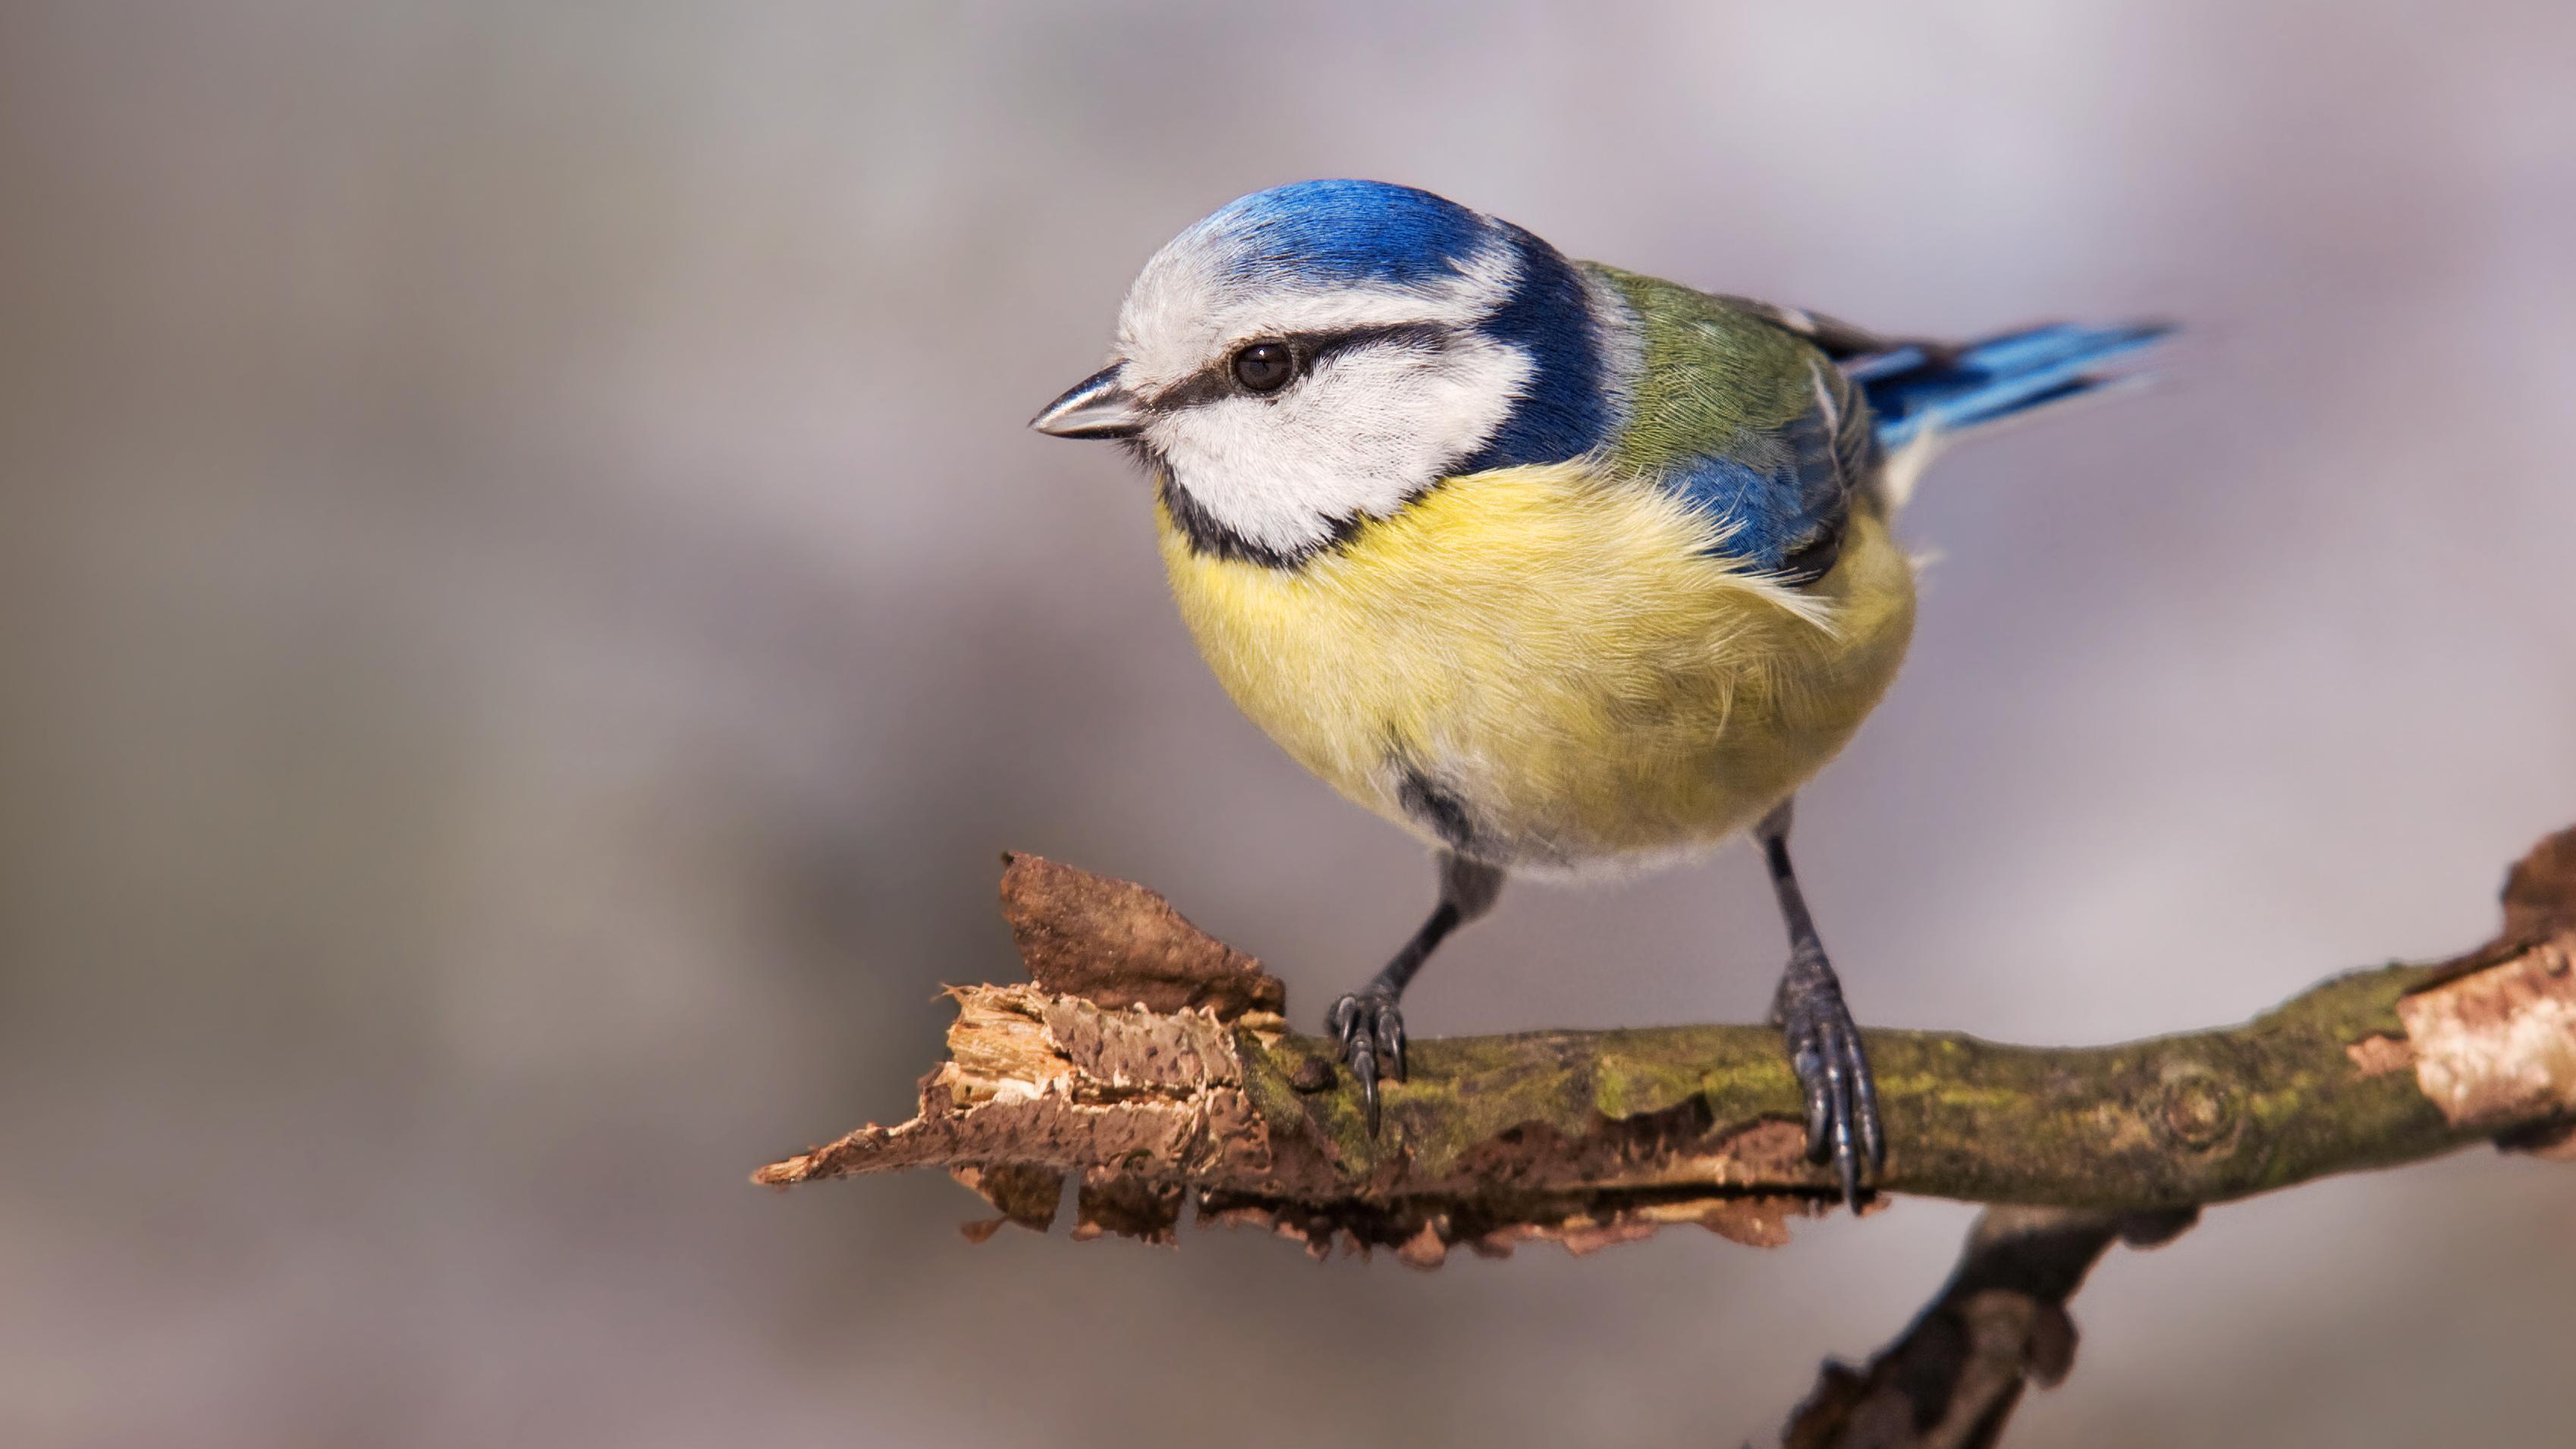 Vögel bestimmen: So geht's per App